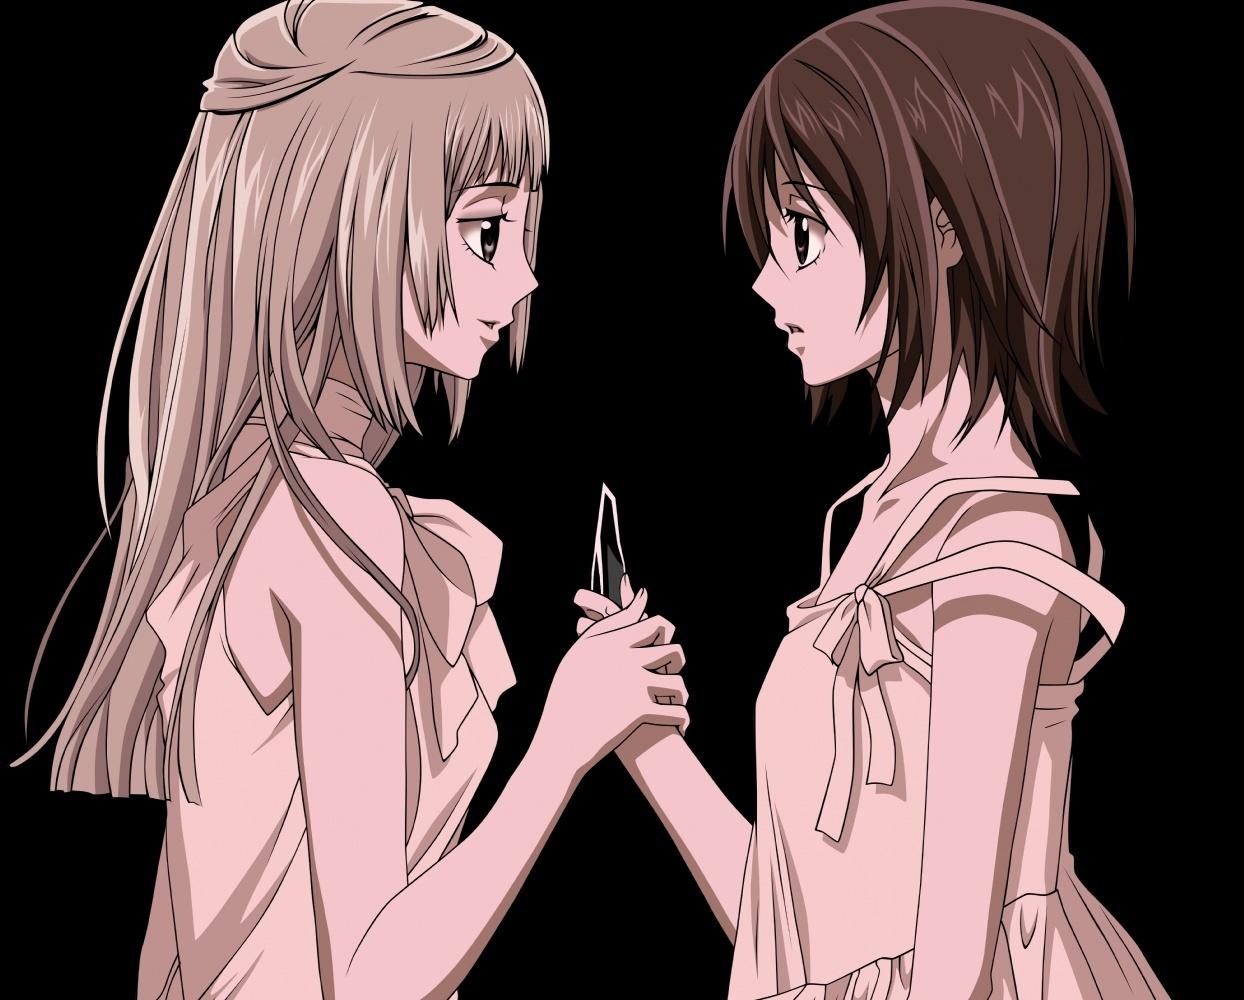 Yuuki and Maria